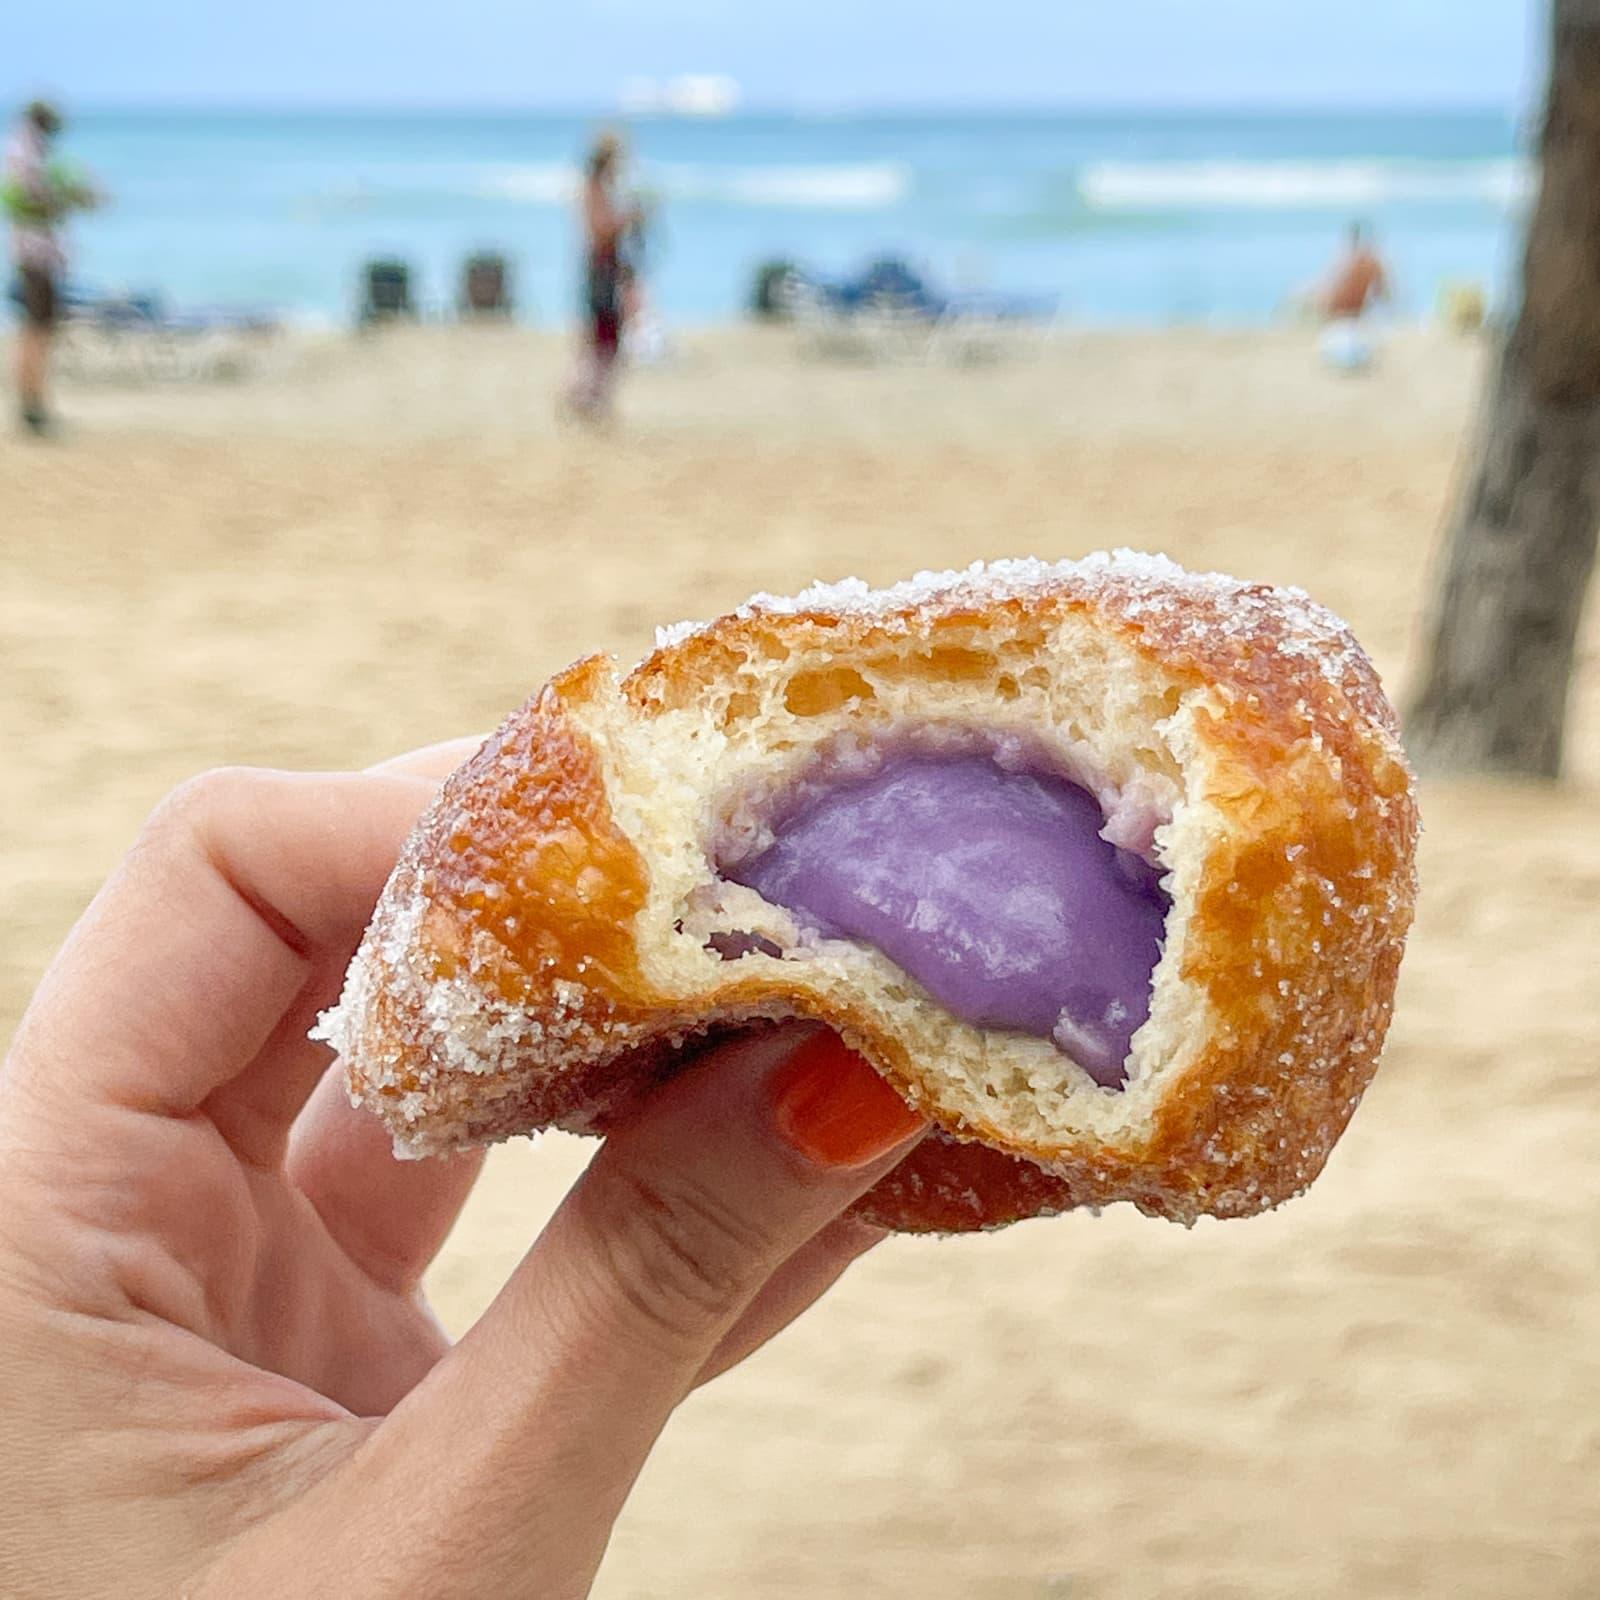 Hawaiian doughnut (yam malasada) from Leonard's Bakery